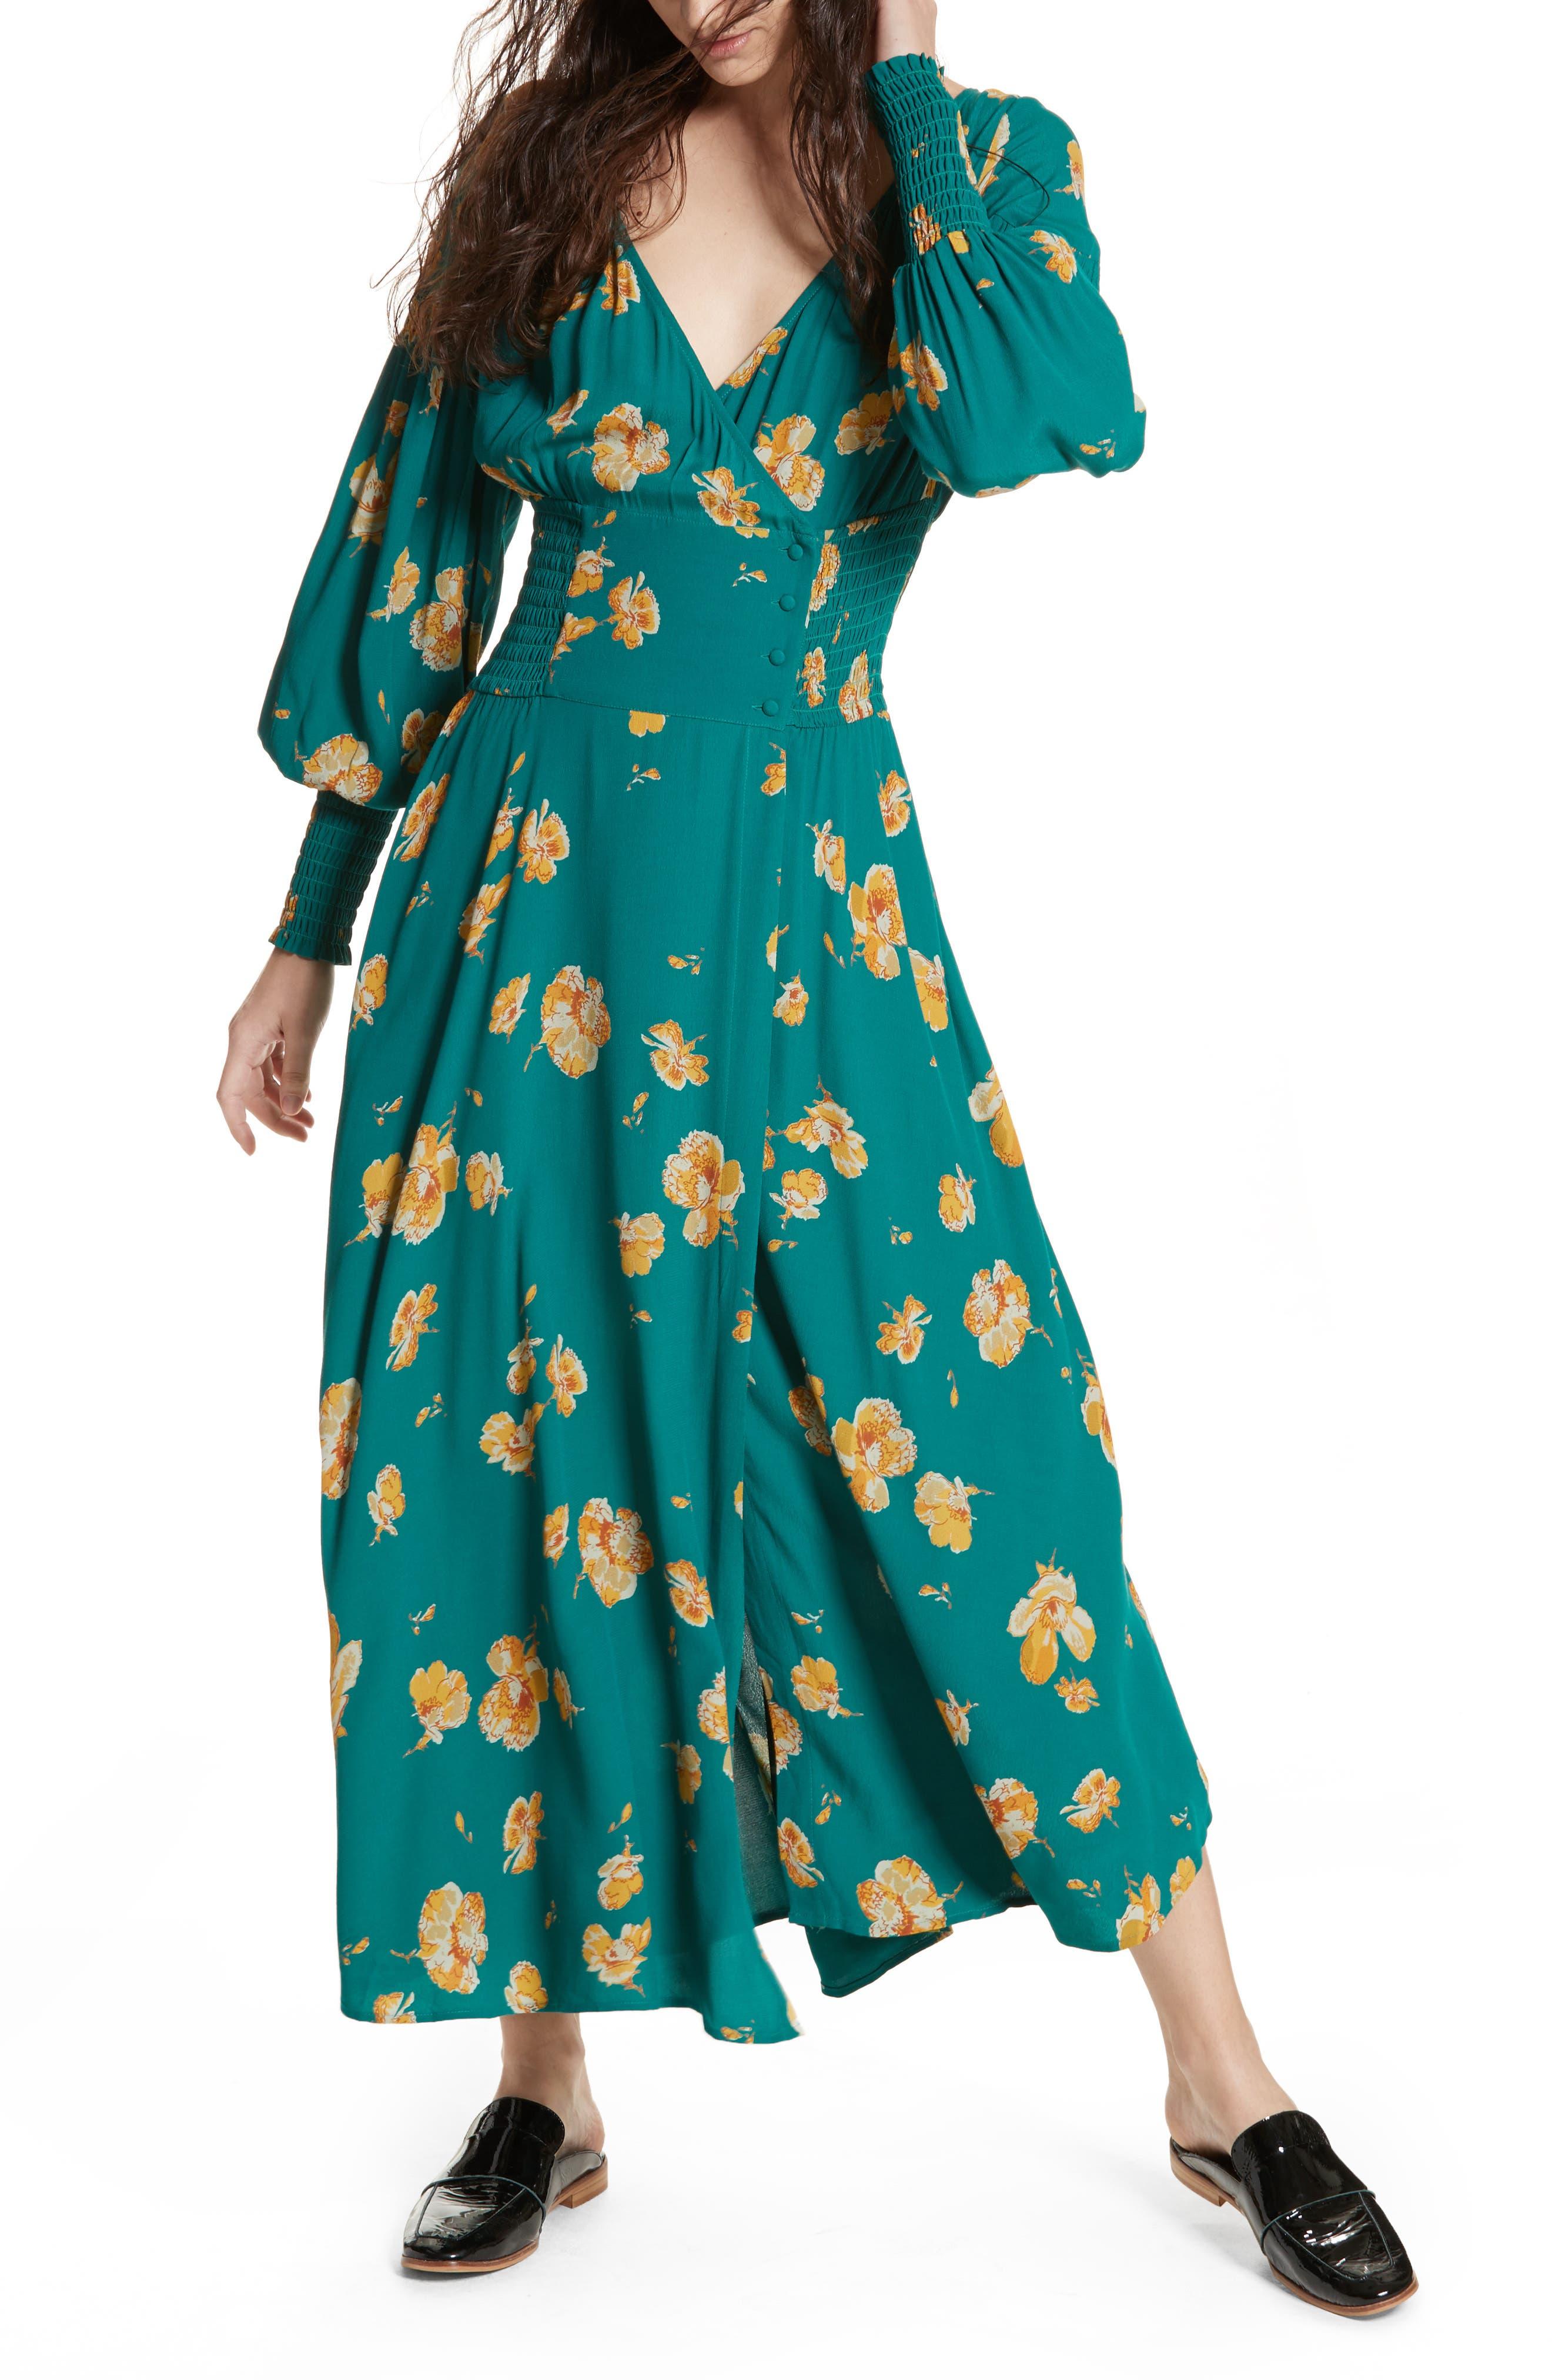 So Sweetly Midi Dress,                         Main,                         color, Green Combo